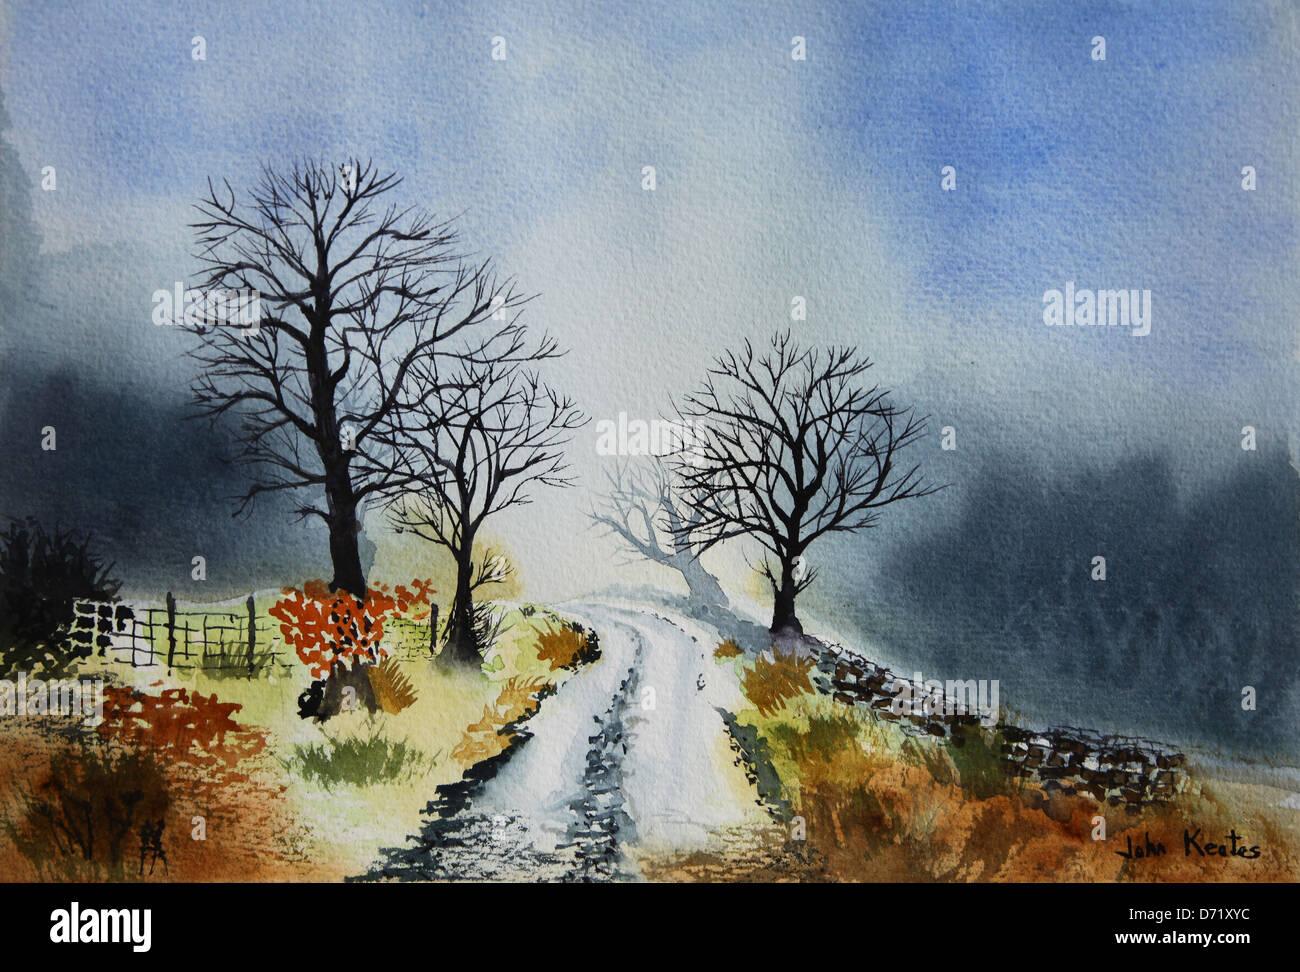 original-watercolour-landscape-painting-by-the-artist-john-keates-D71XYC.jpg